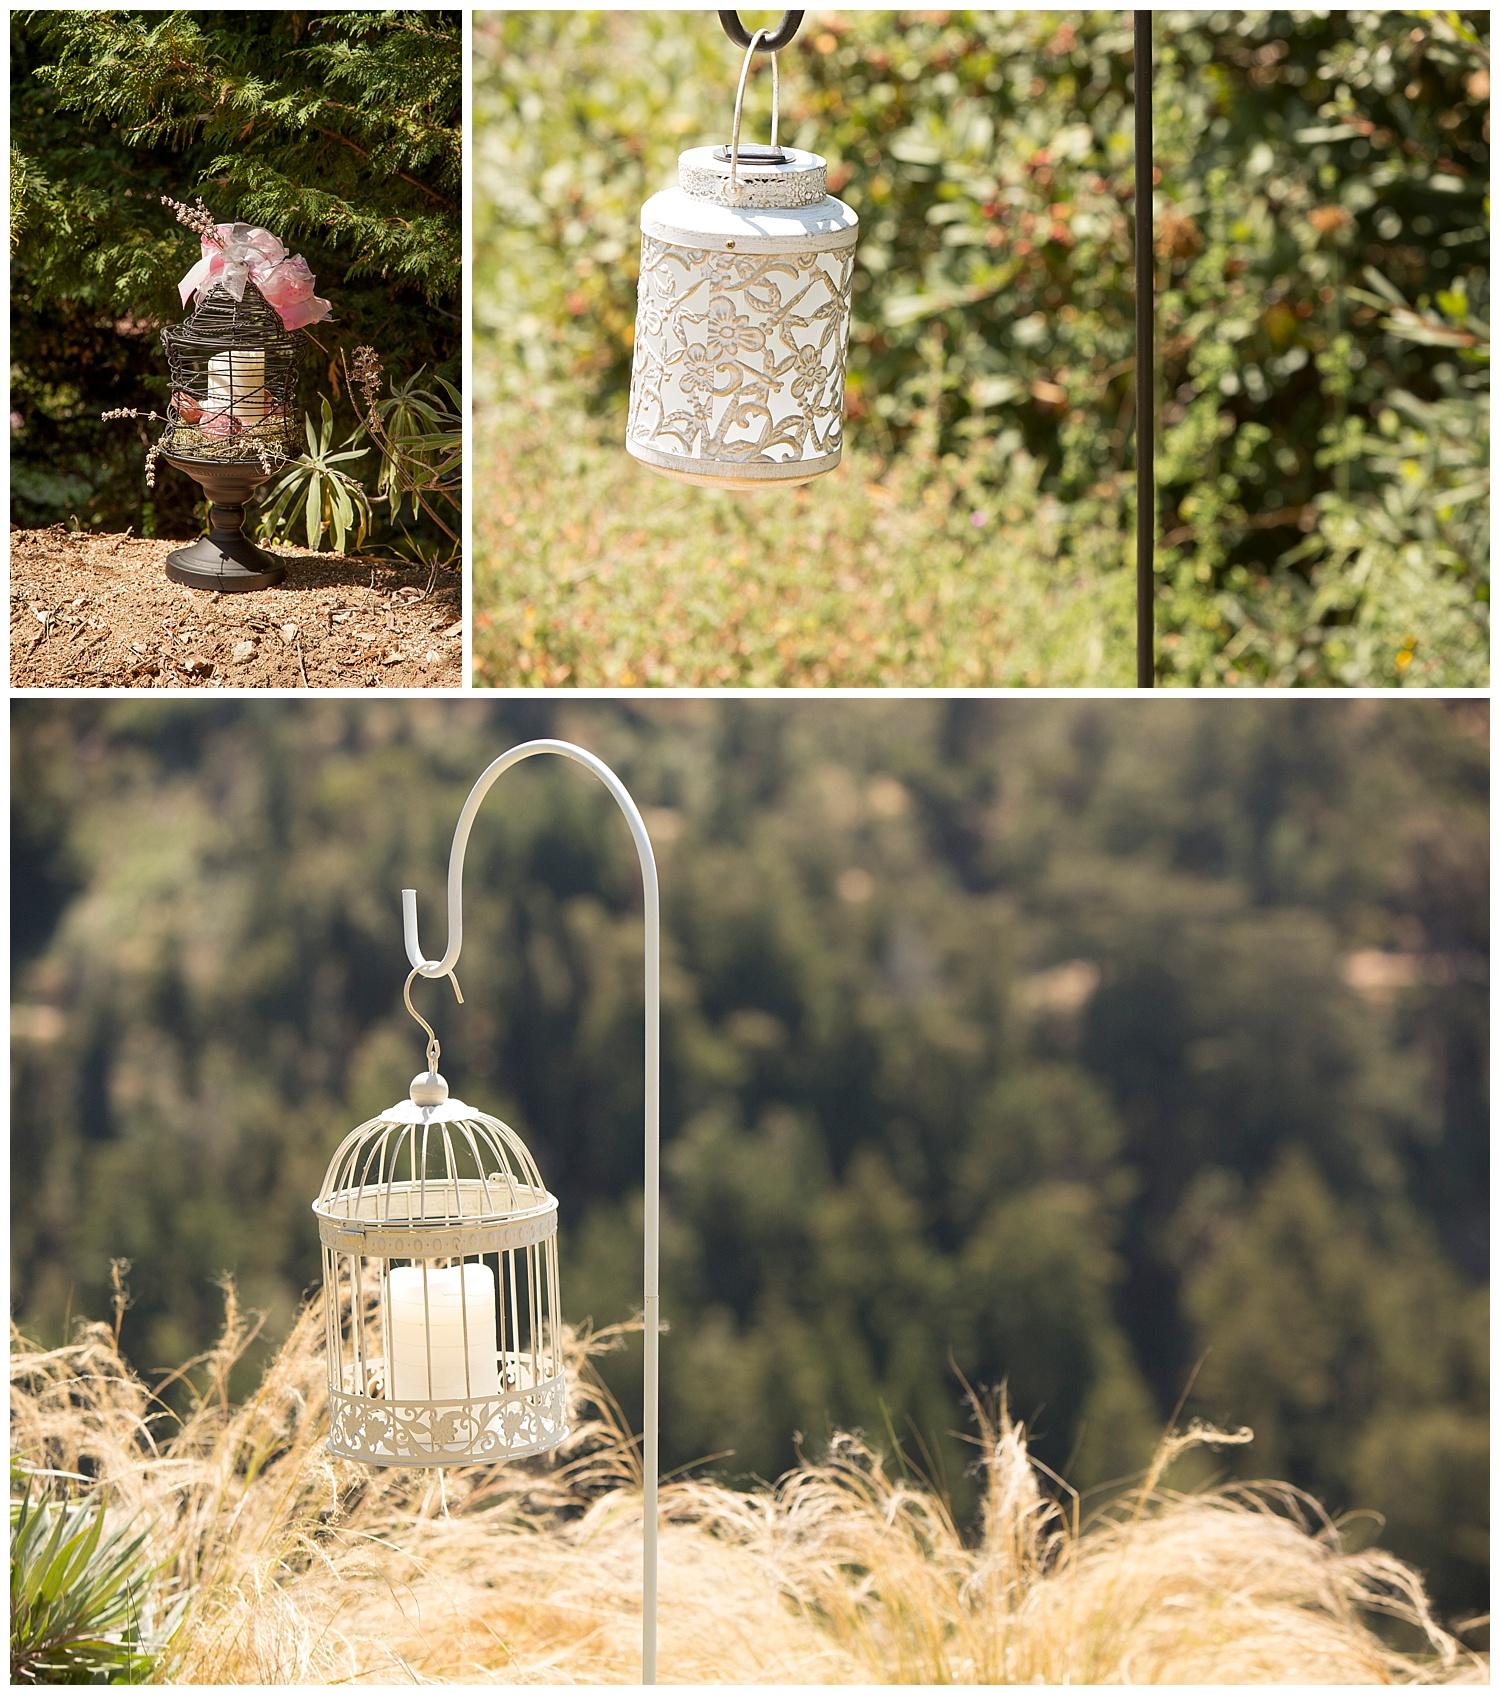 big-sur-summer-wedding-lamp-details-carol-oliva-photography.jpg